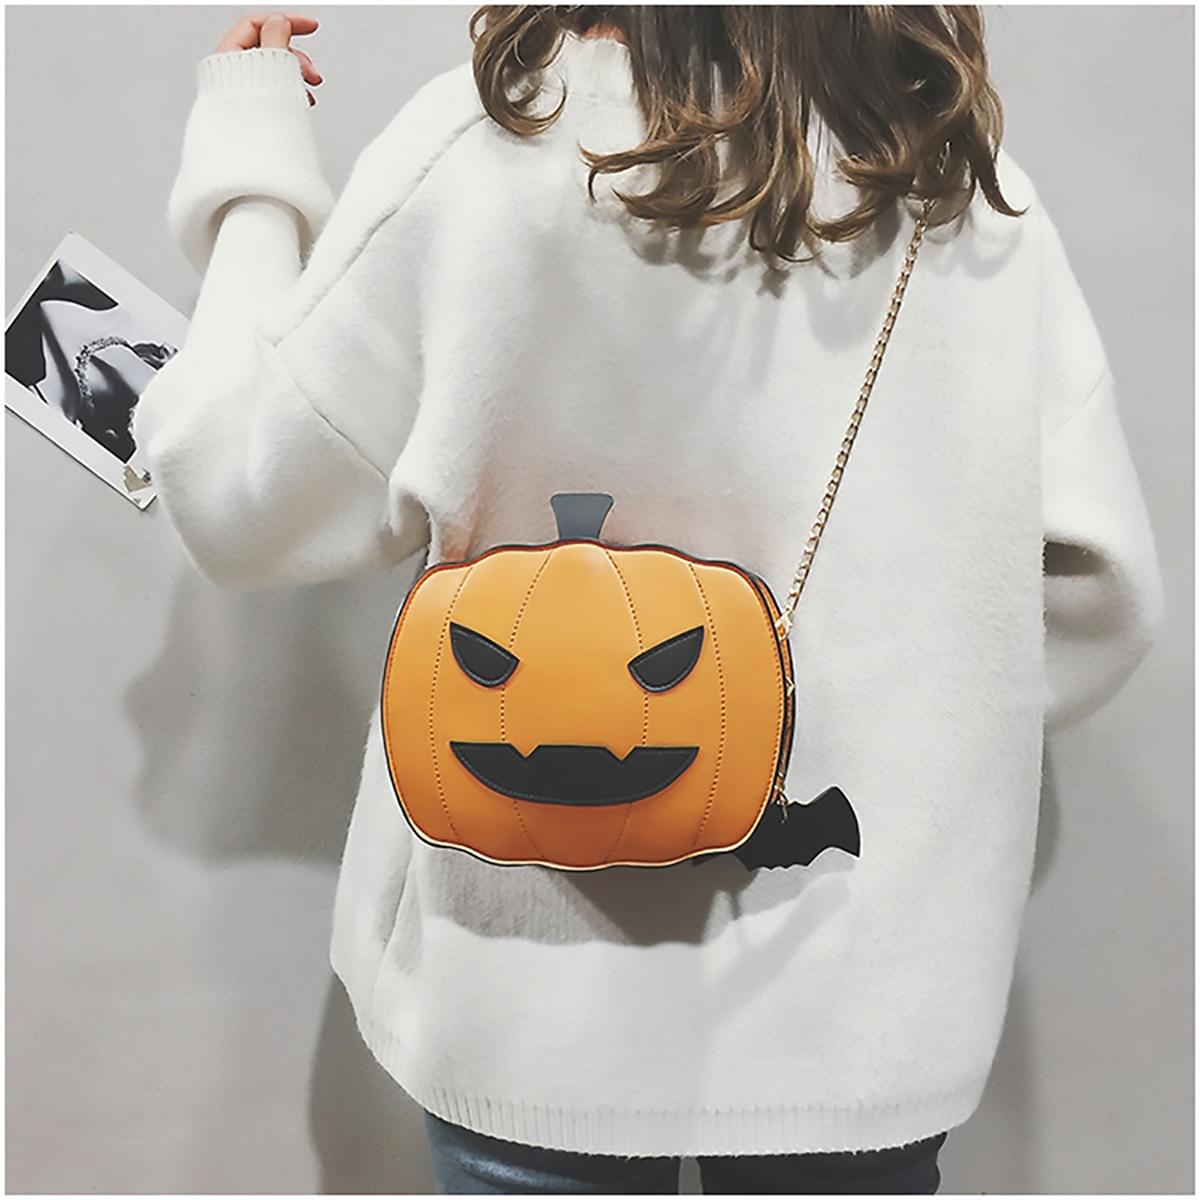 Shoulder Bag Pumpkin Bag For Women Pu Leather Creativity Easter Halloween Lamp Handbags New Designed  Cross Body Bags Gift 5